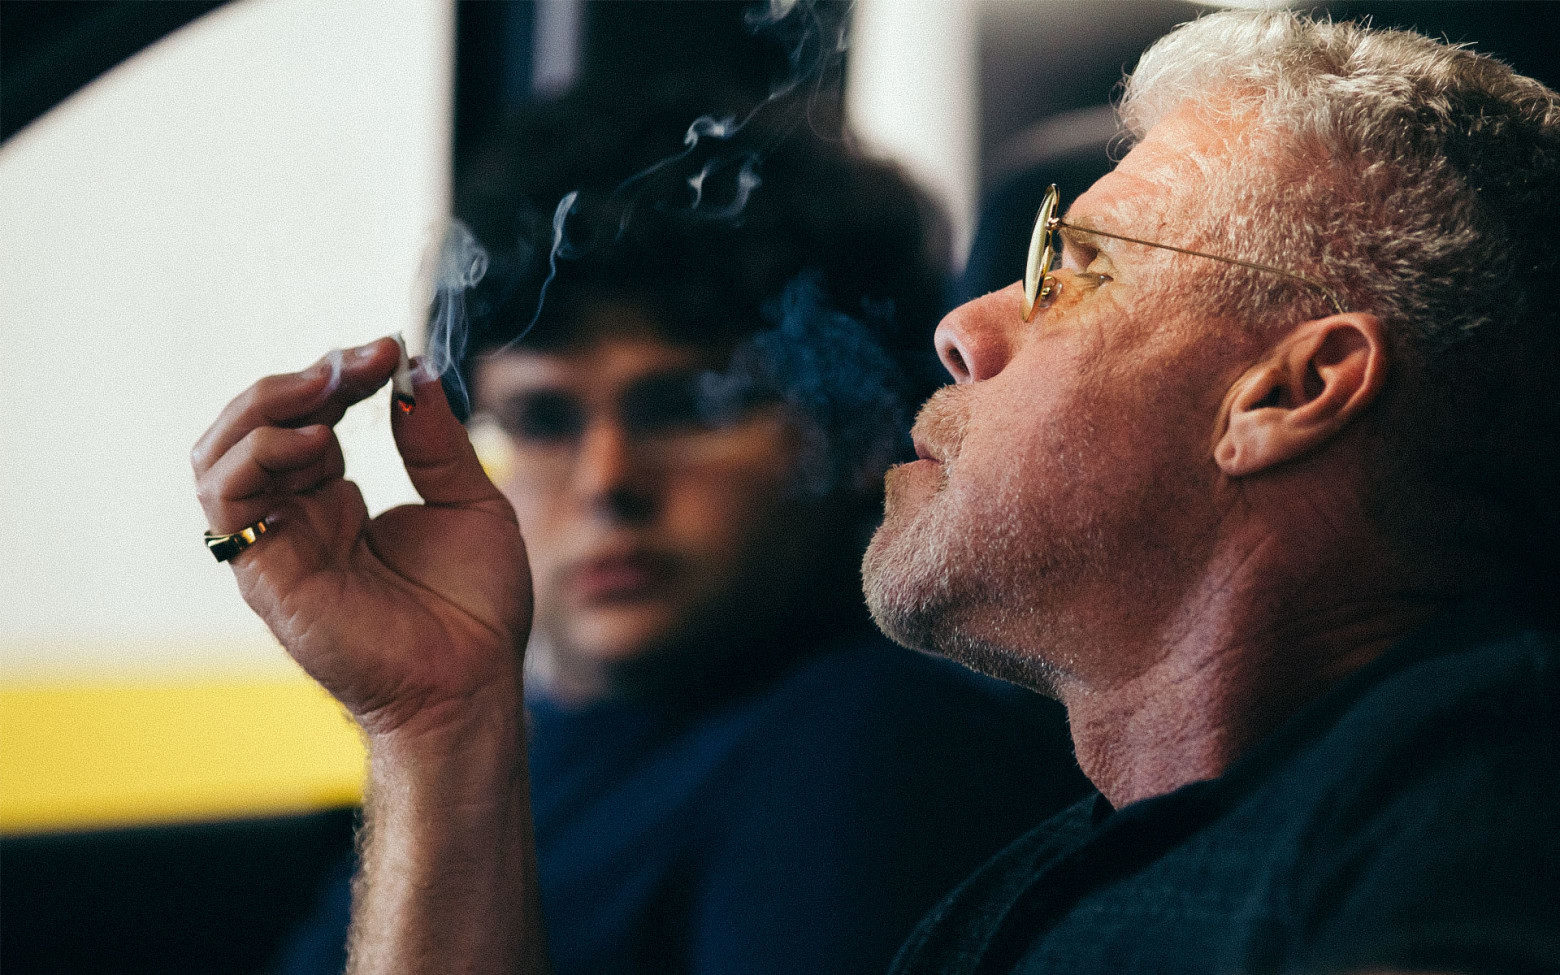 Ron Perlman in Kid Cannabis